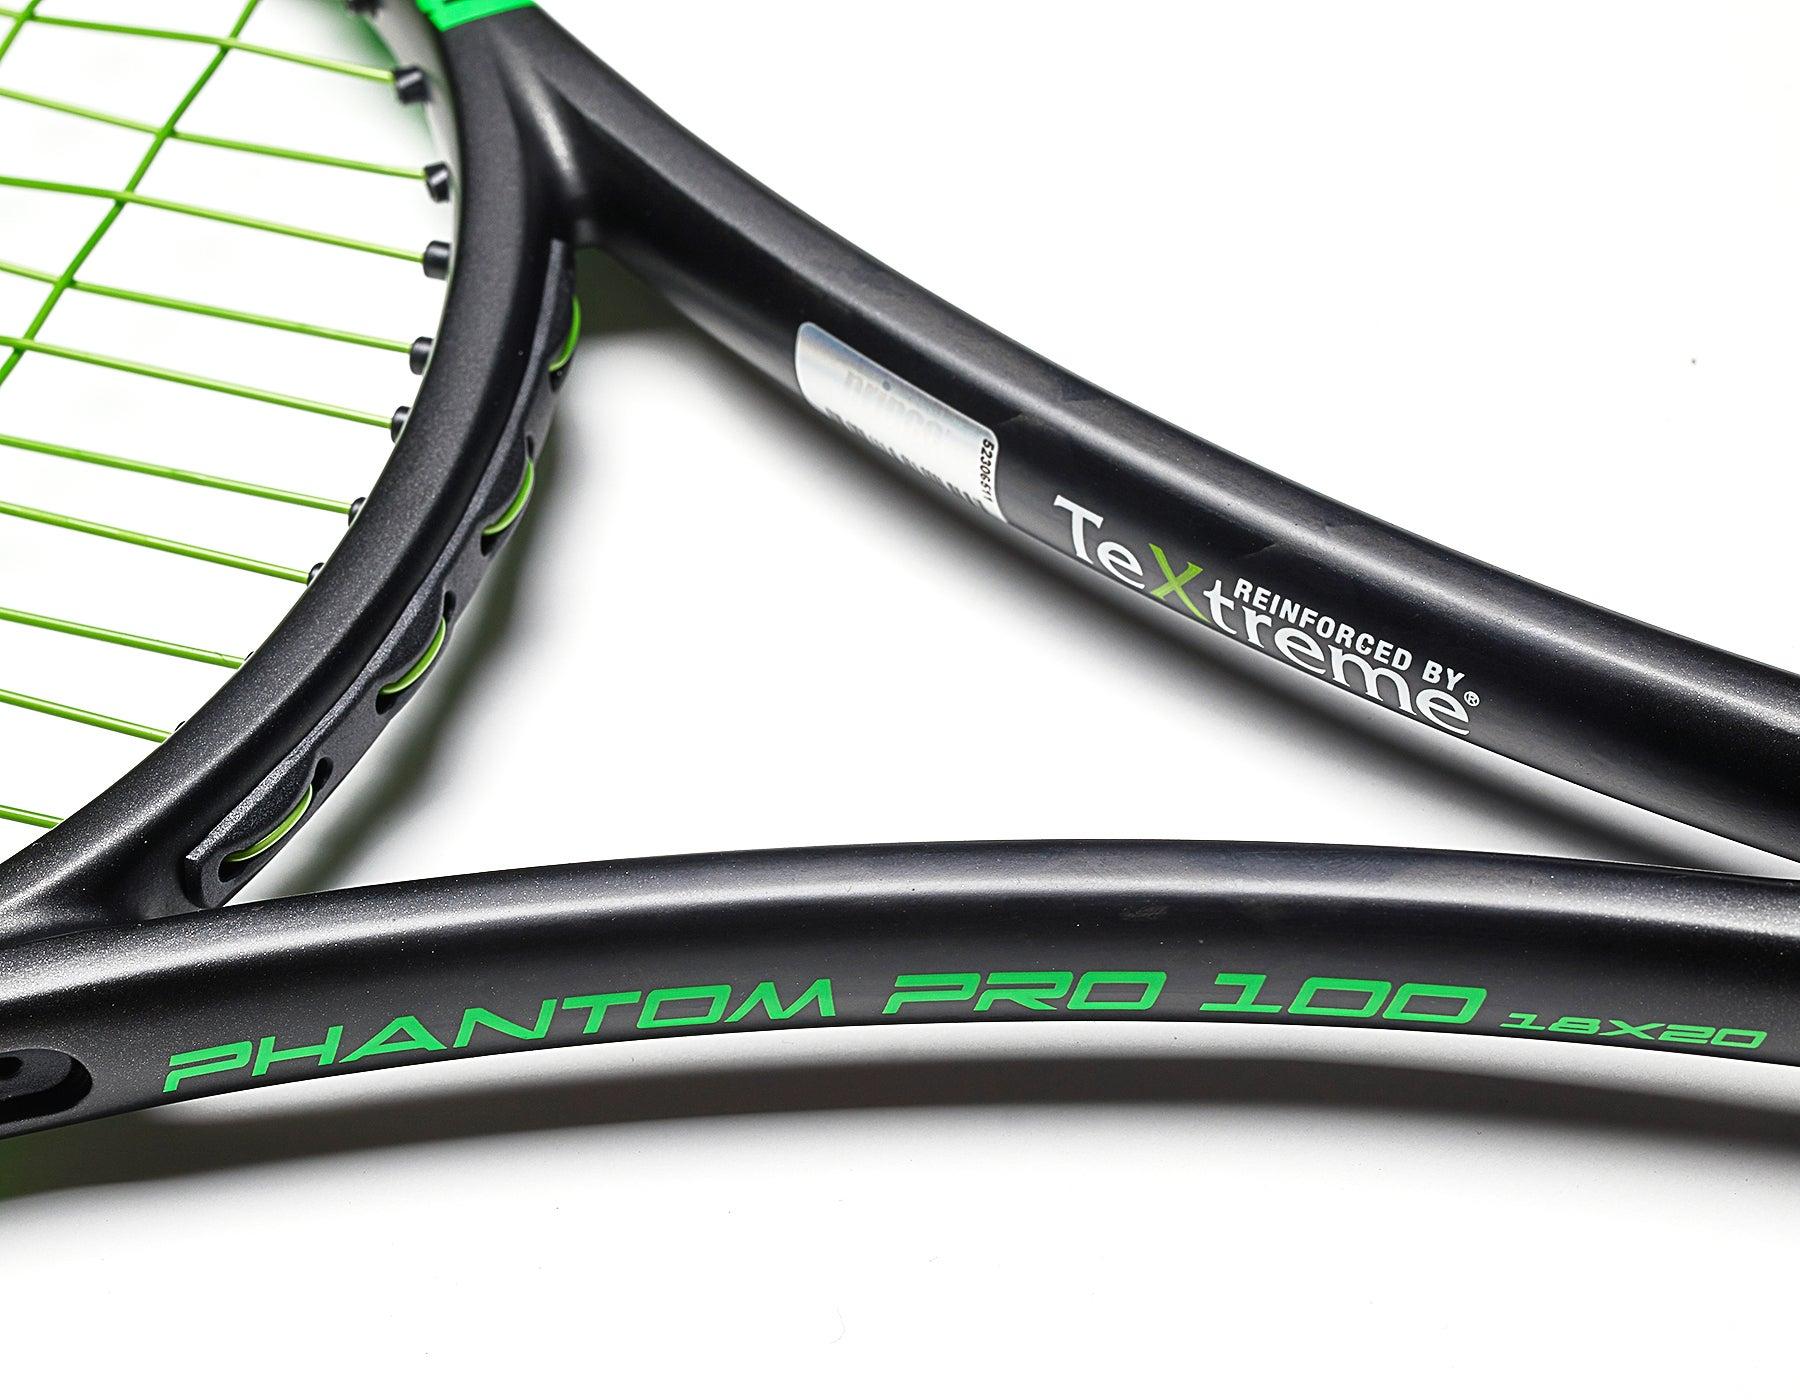 Prince TXT Phantom Pro 100/Tennis